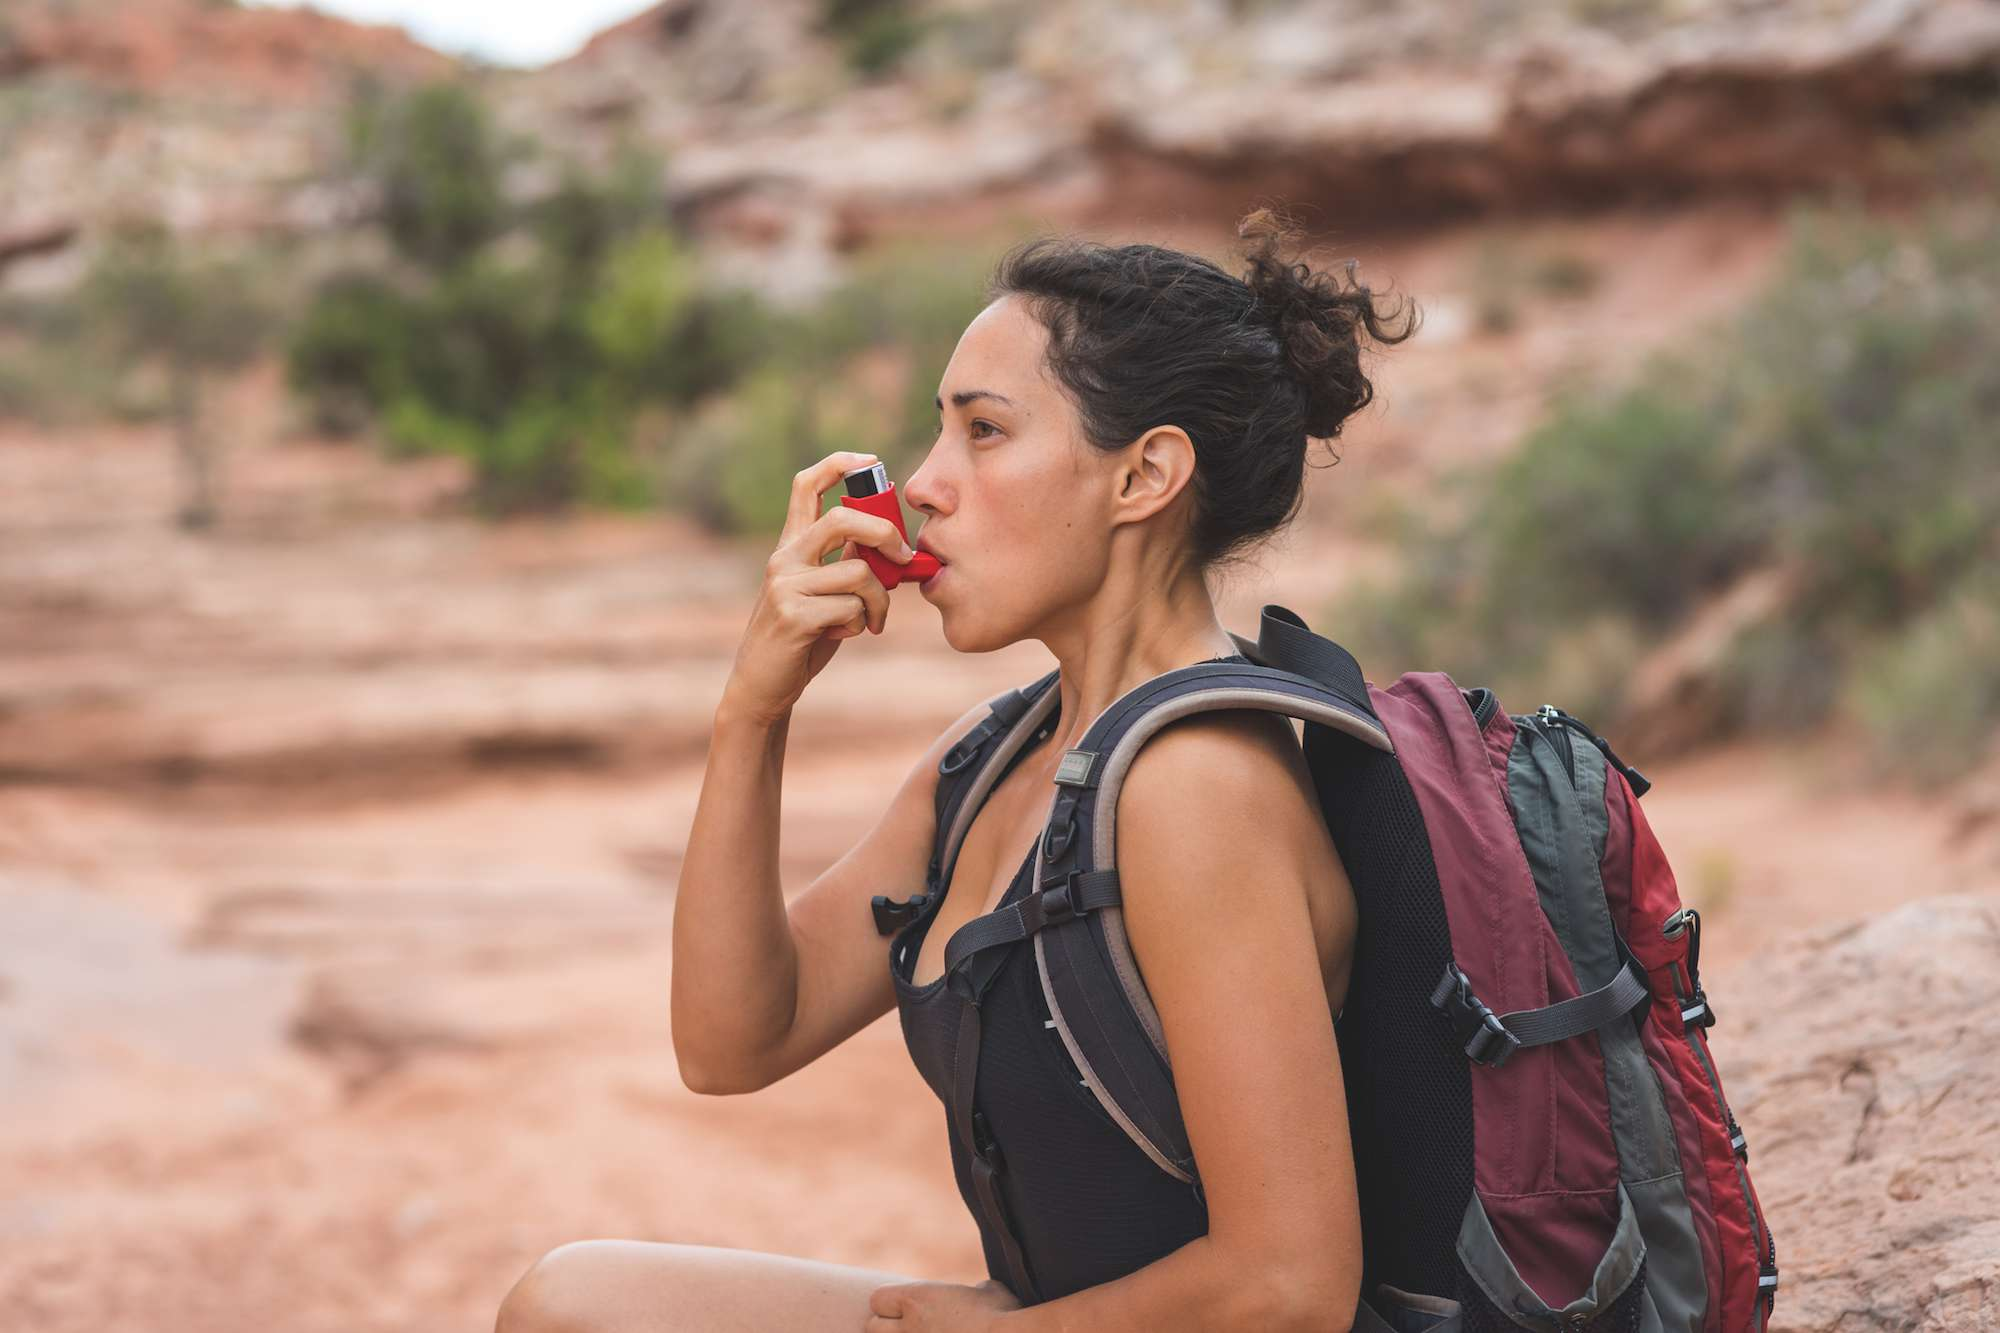 Woman using inhaler while hiking